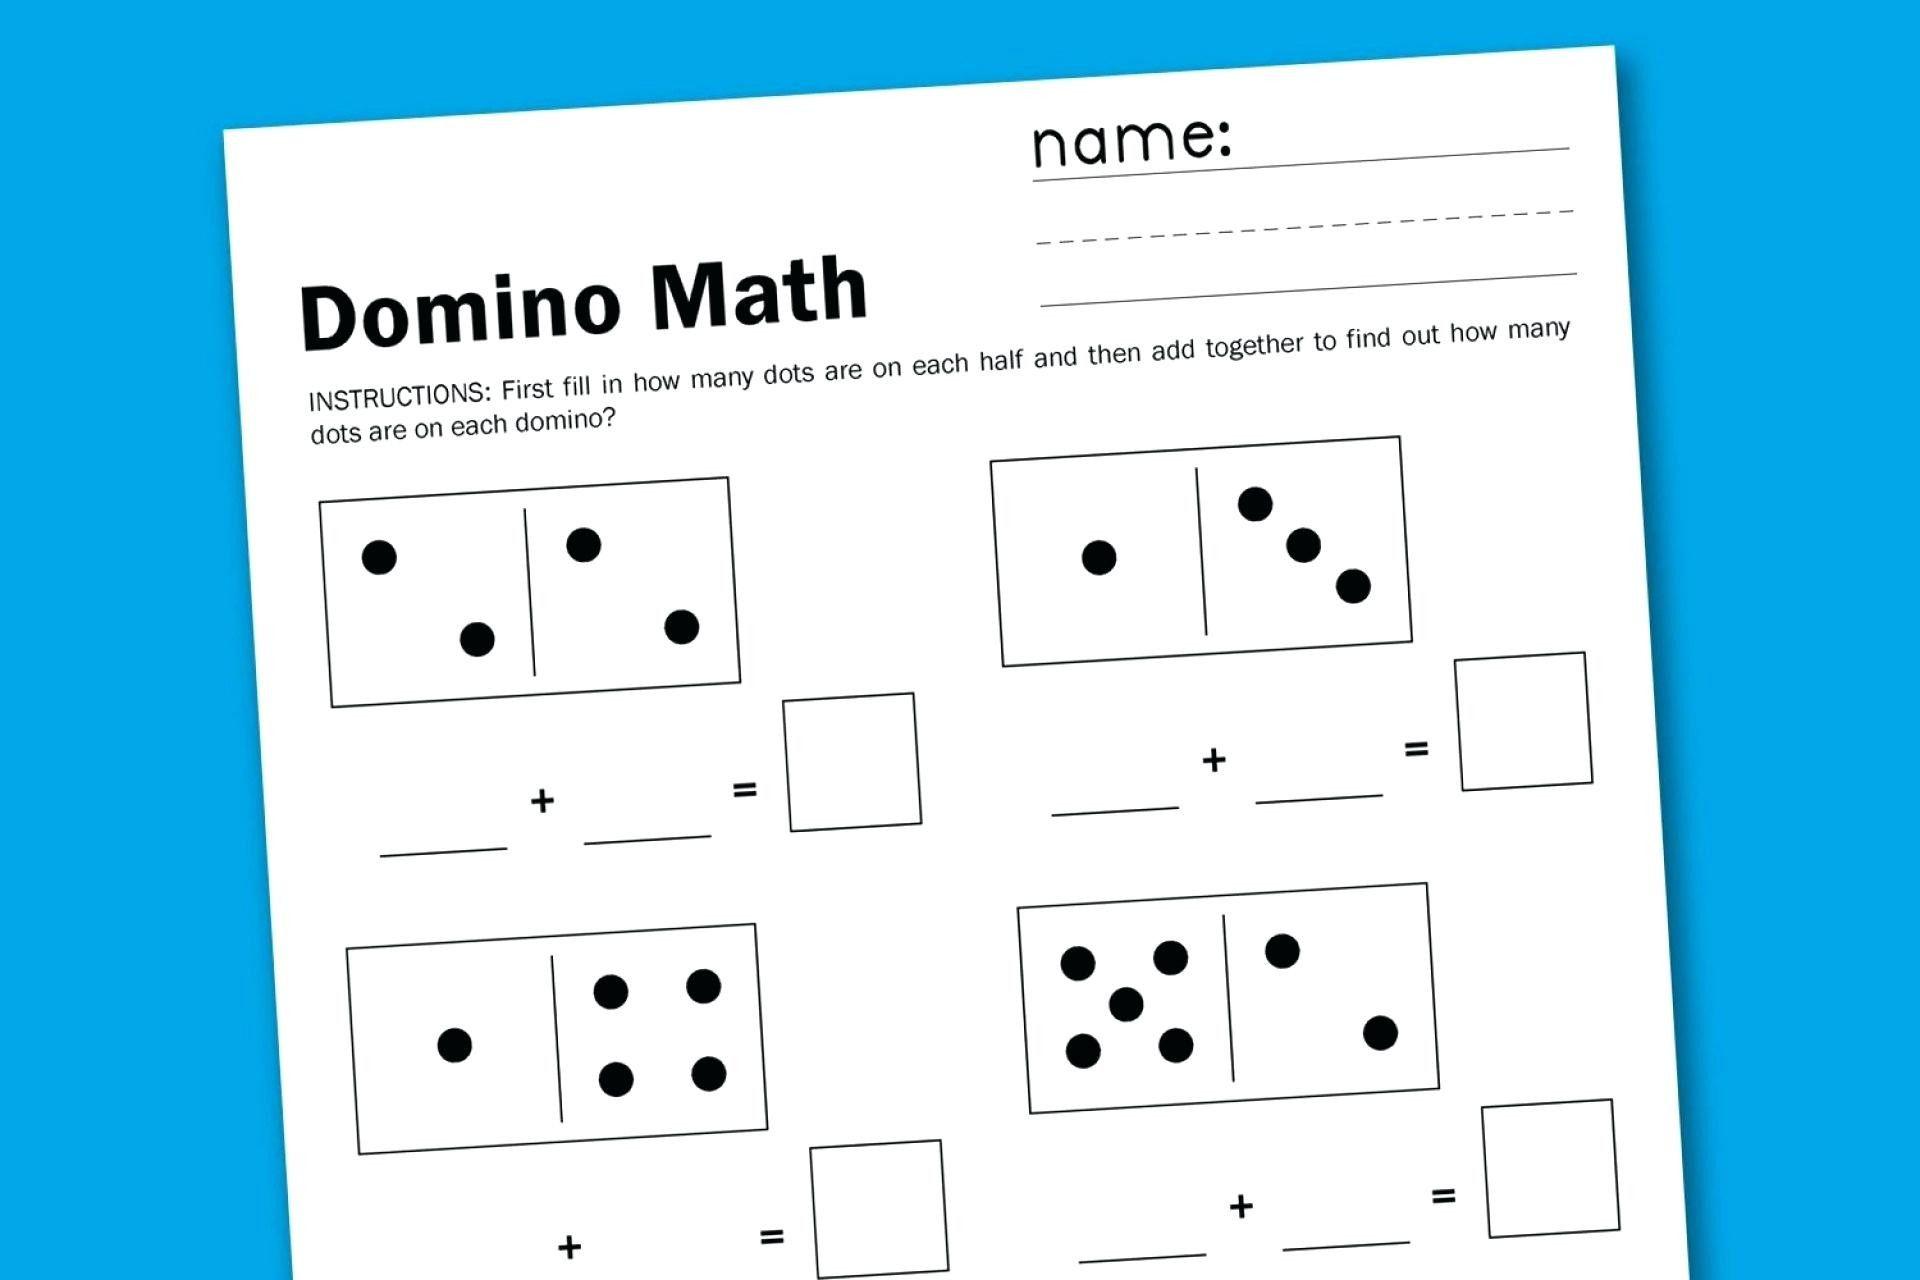 5 Free Math Worksheets First Grade 1 Addition Number Lines math worksheets  domino addition fr...   Free math worksheets [ 1280 x 1920 Pixel ]